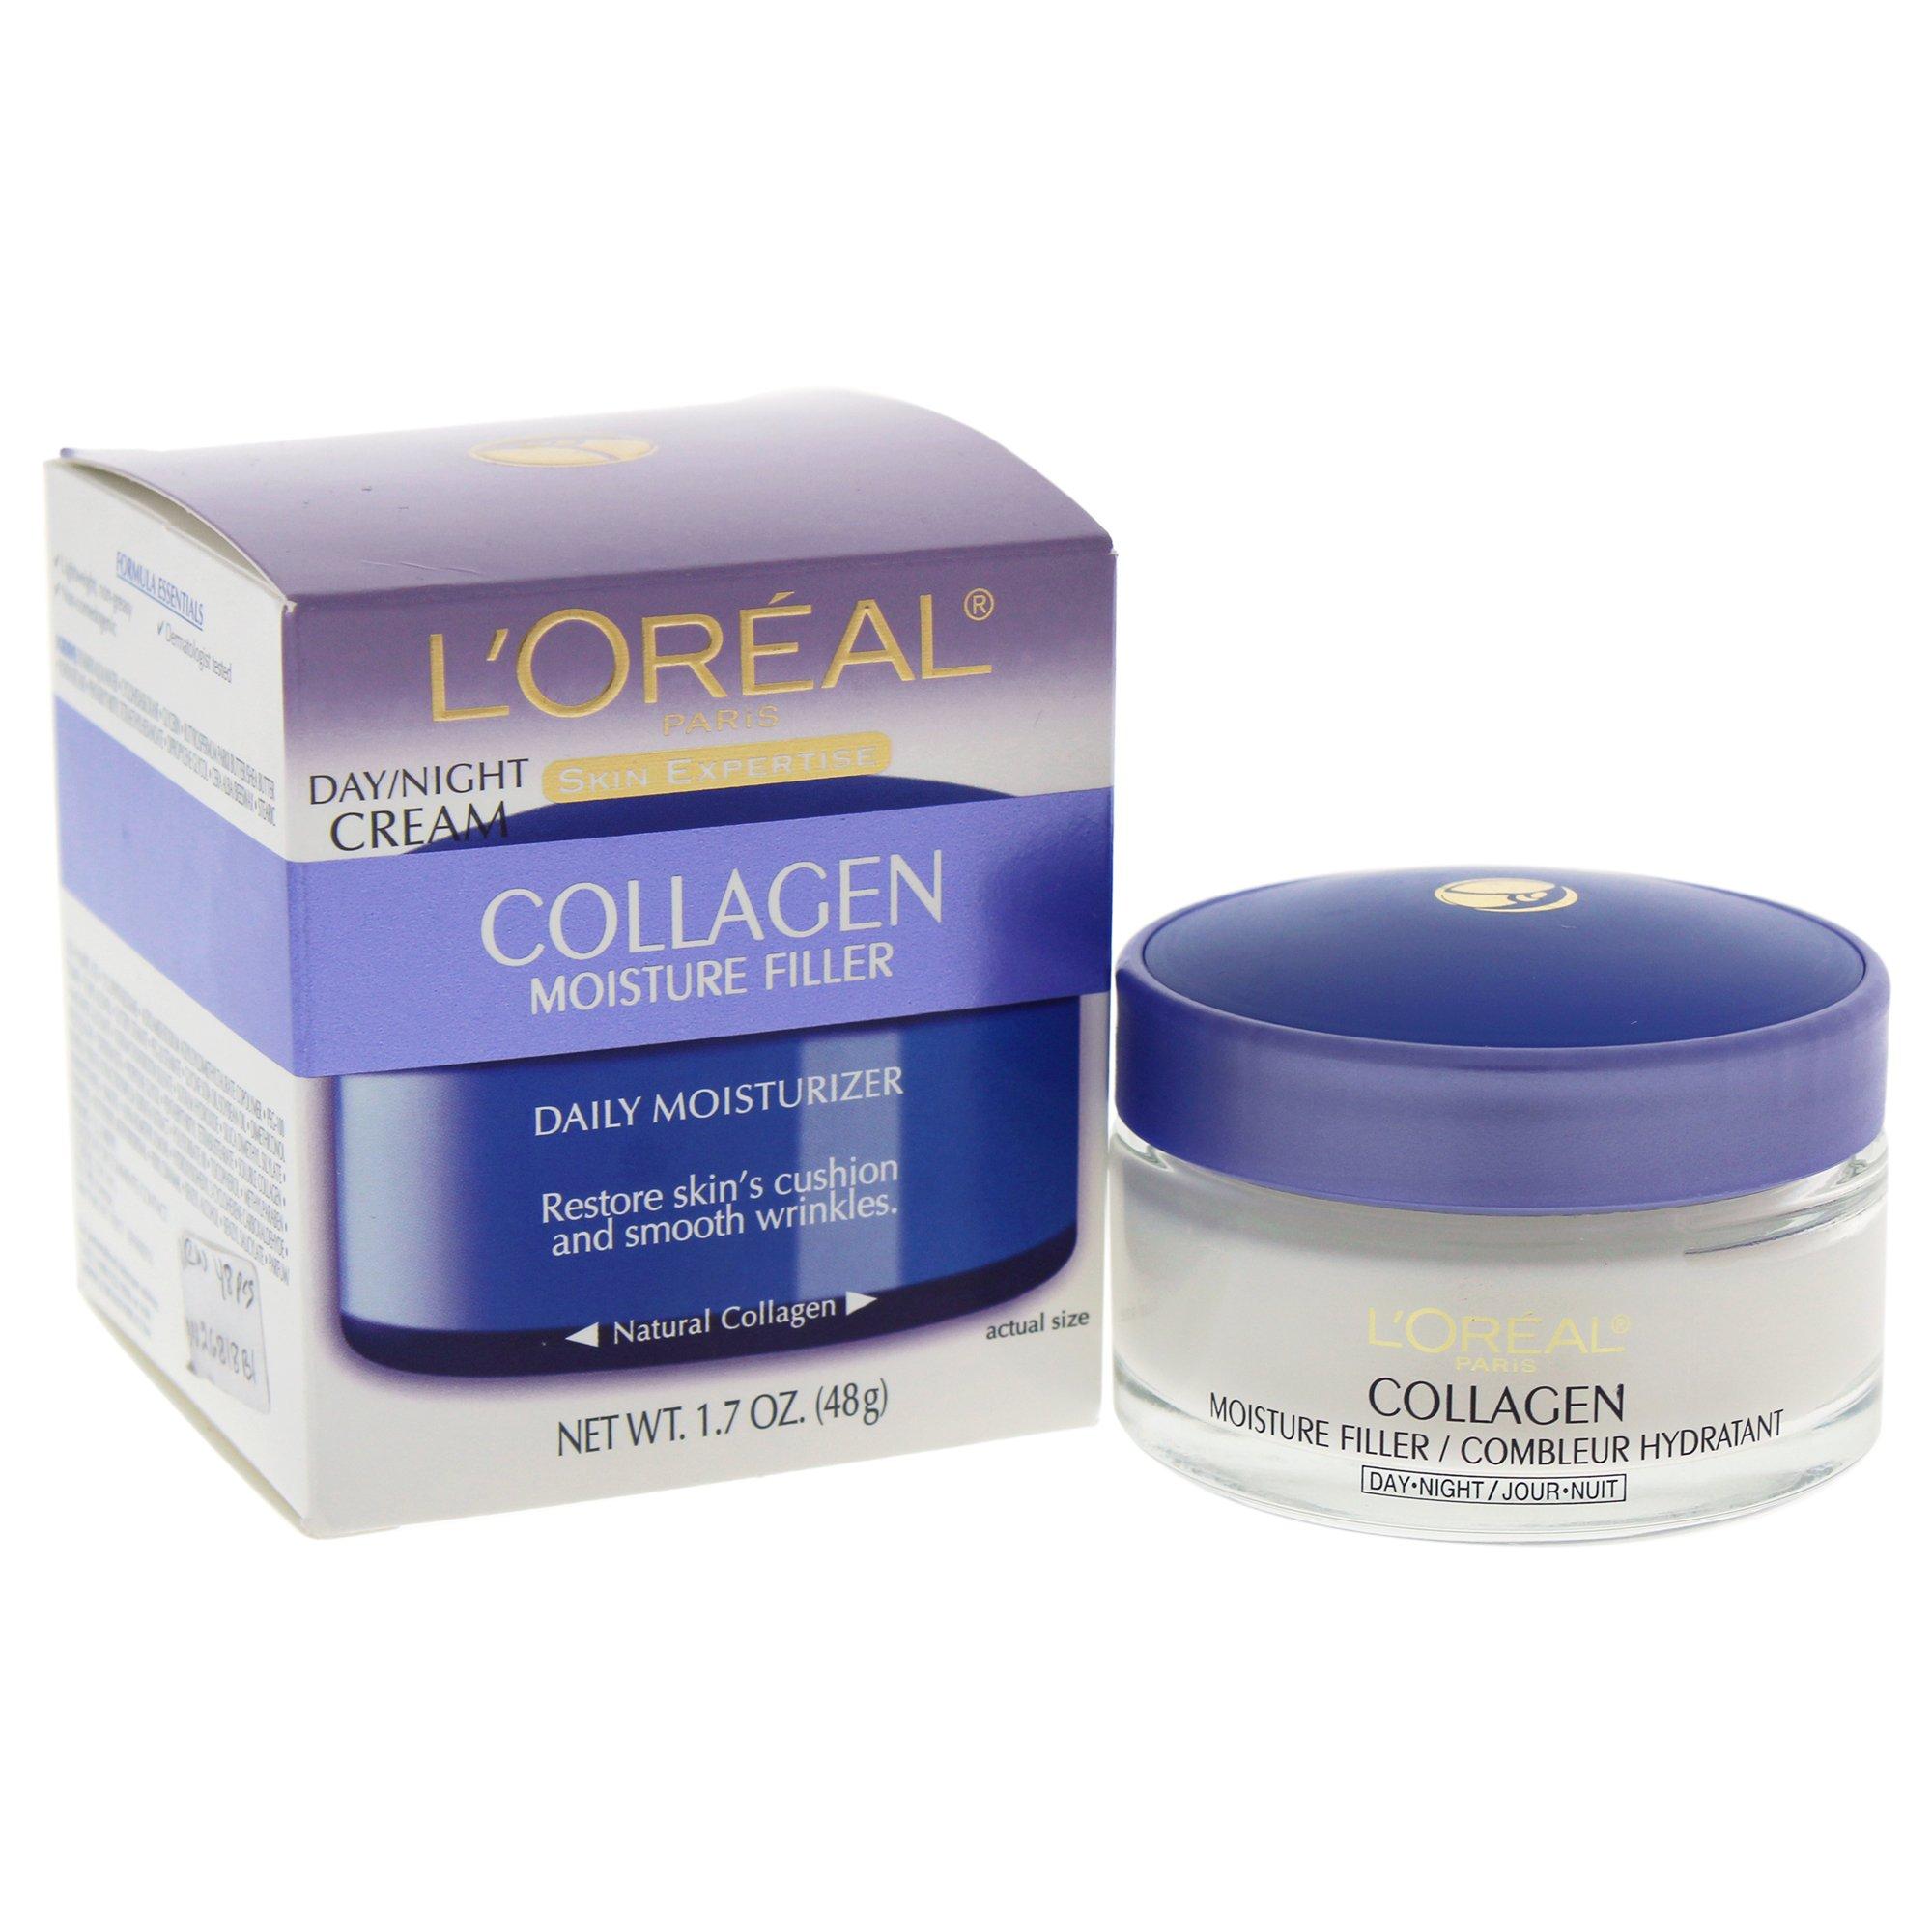 L'Oreal Paris Collagen Moisture Filler Anti Aging Night Face Cream, Dermatologist tested for gentleness, 1.7 oz.